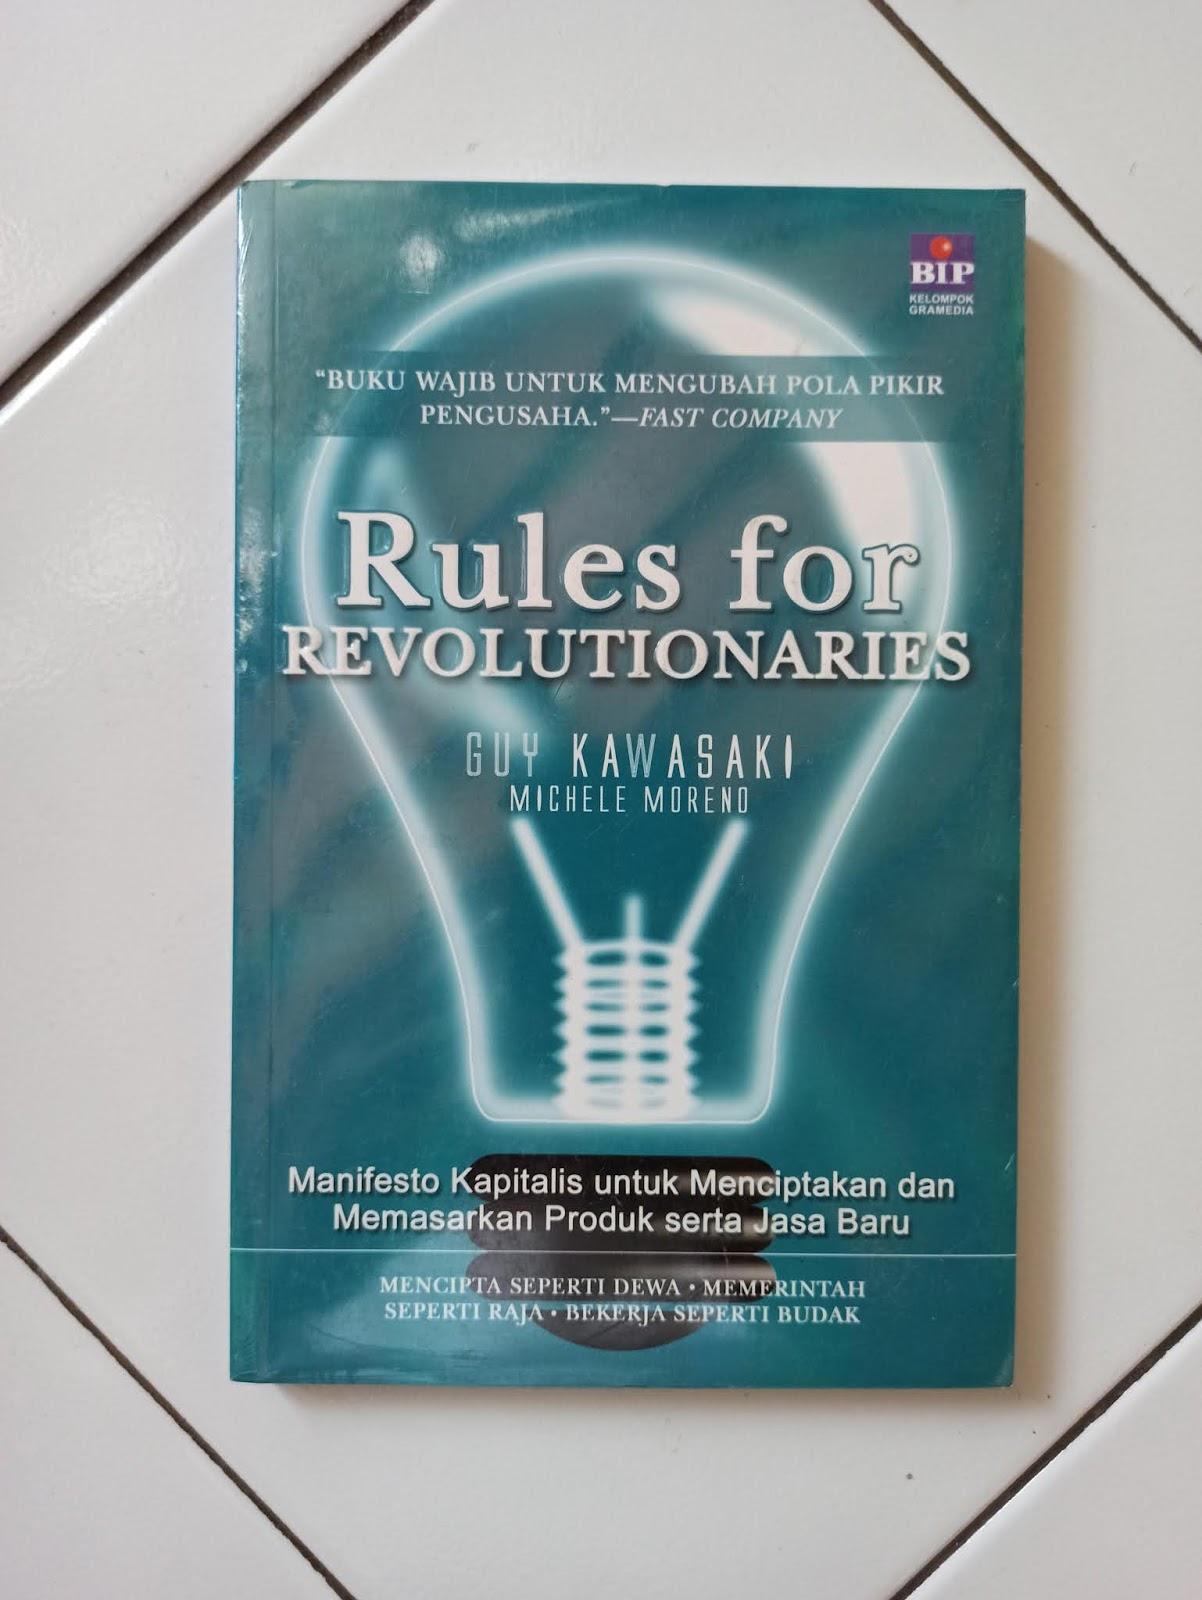 Buku Rules for Revolutionaries Guy Kawasaki